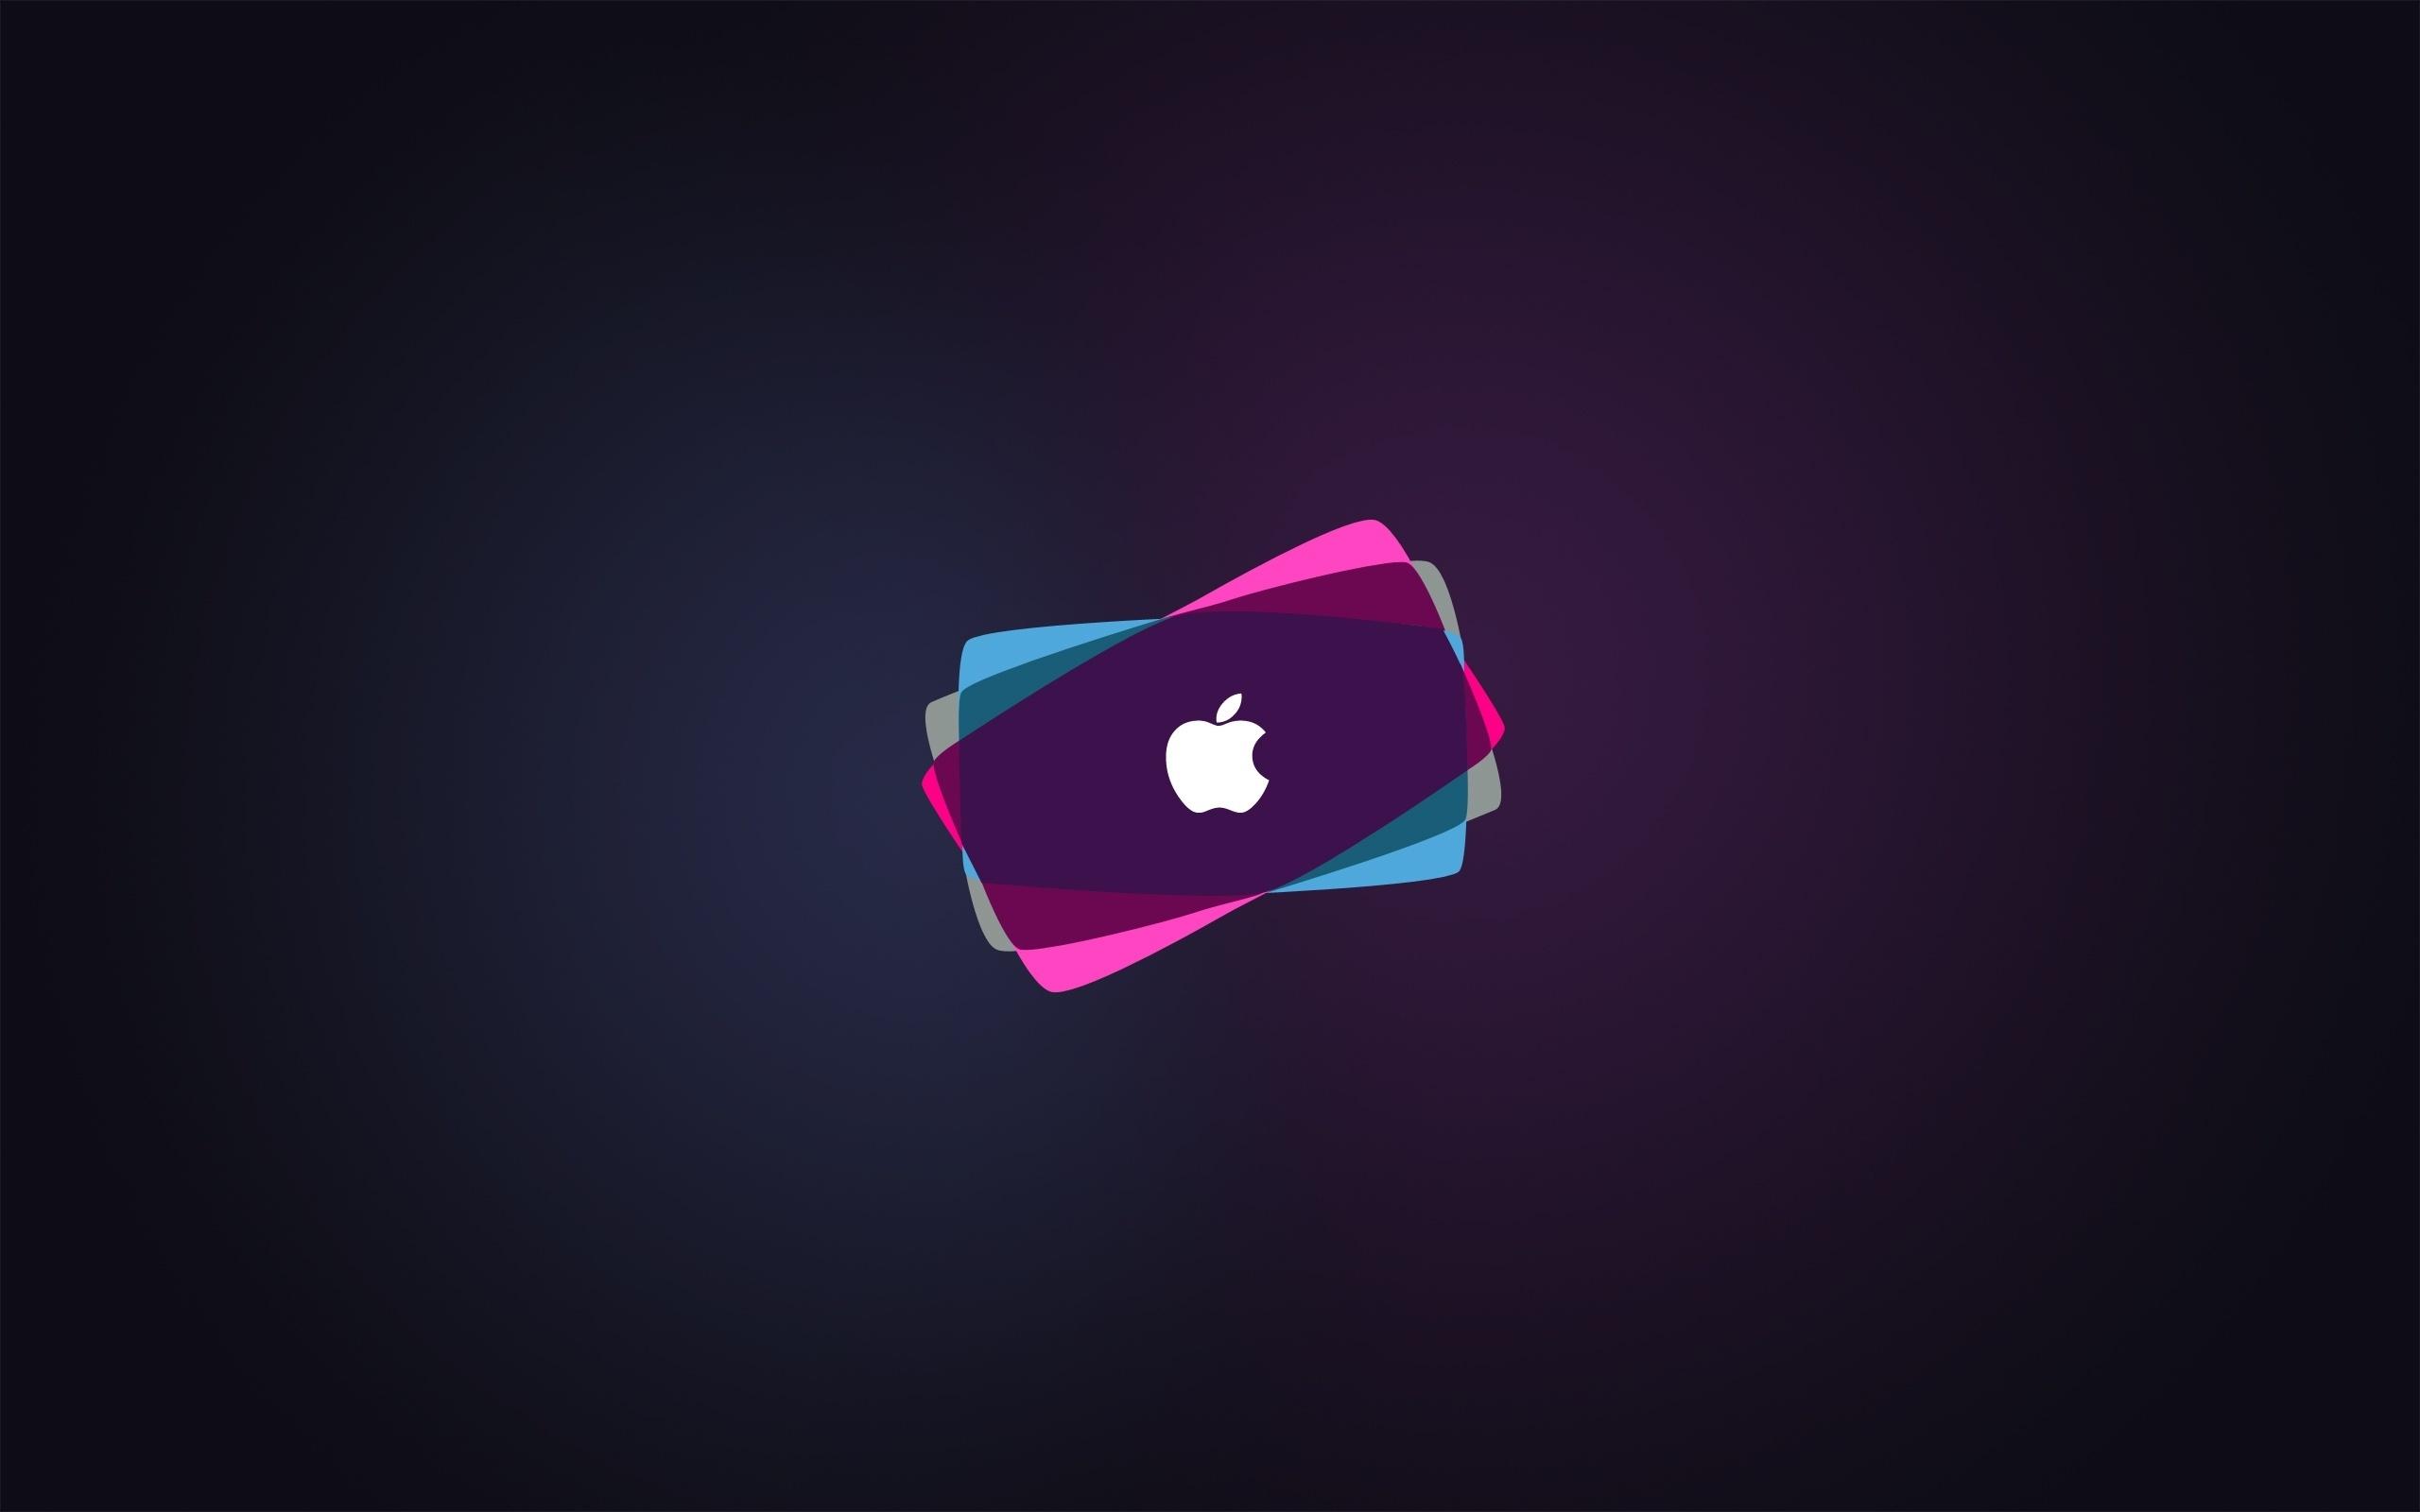 Apple Macbook Pro Wallpaper Sf Wallpaper